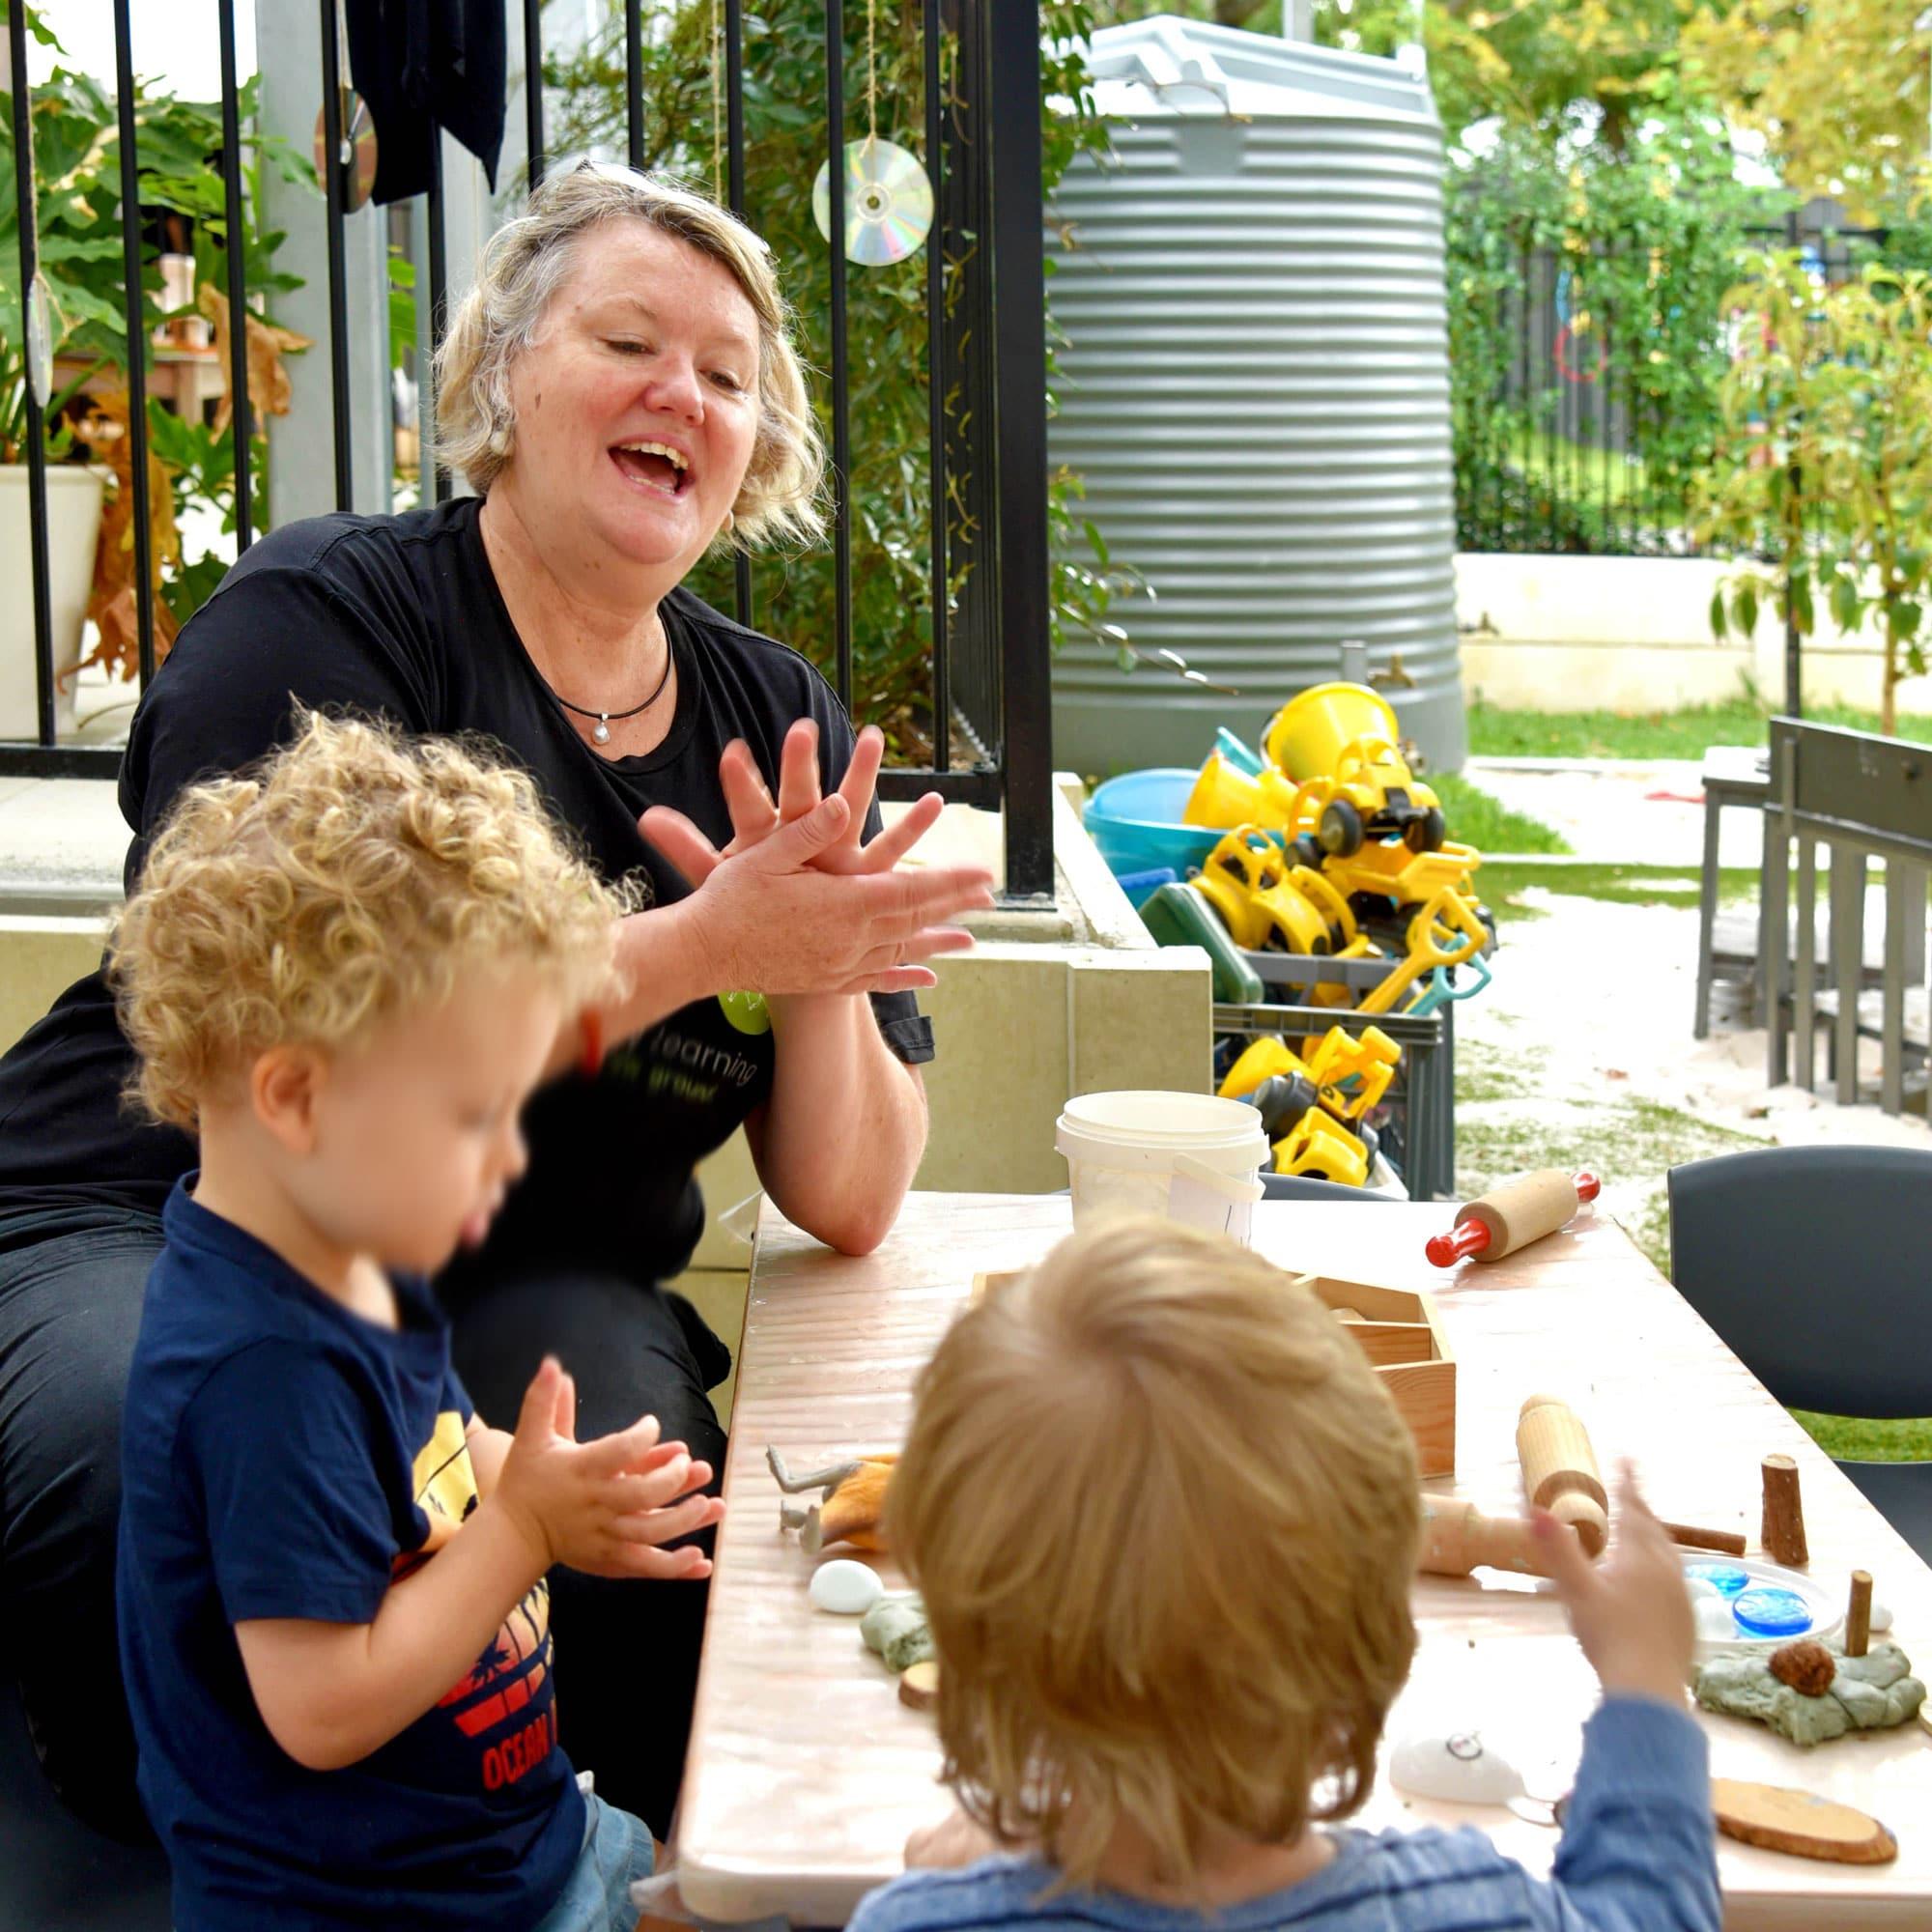 Louise De Boer: Deputy Principal of SOEL